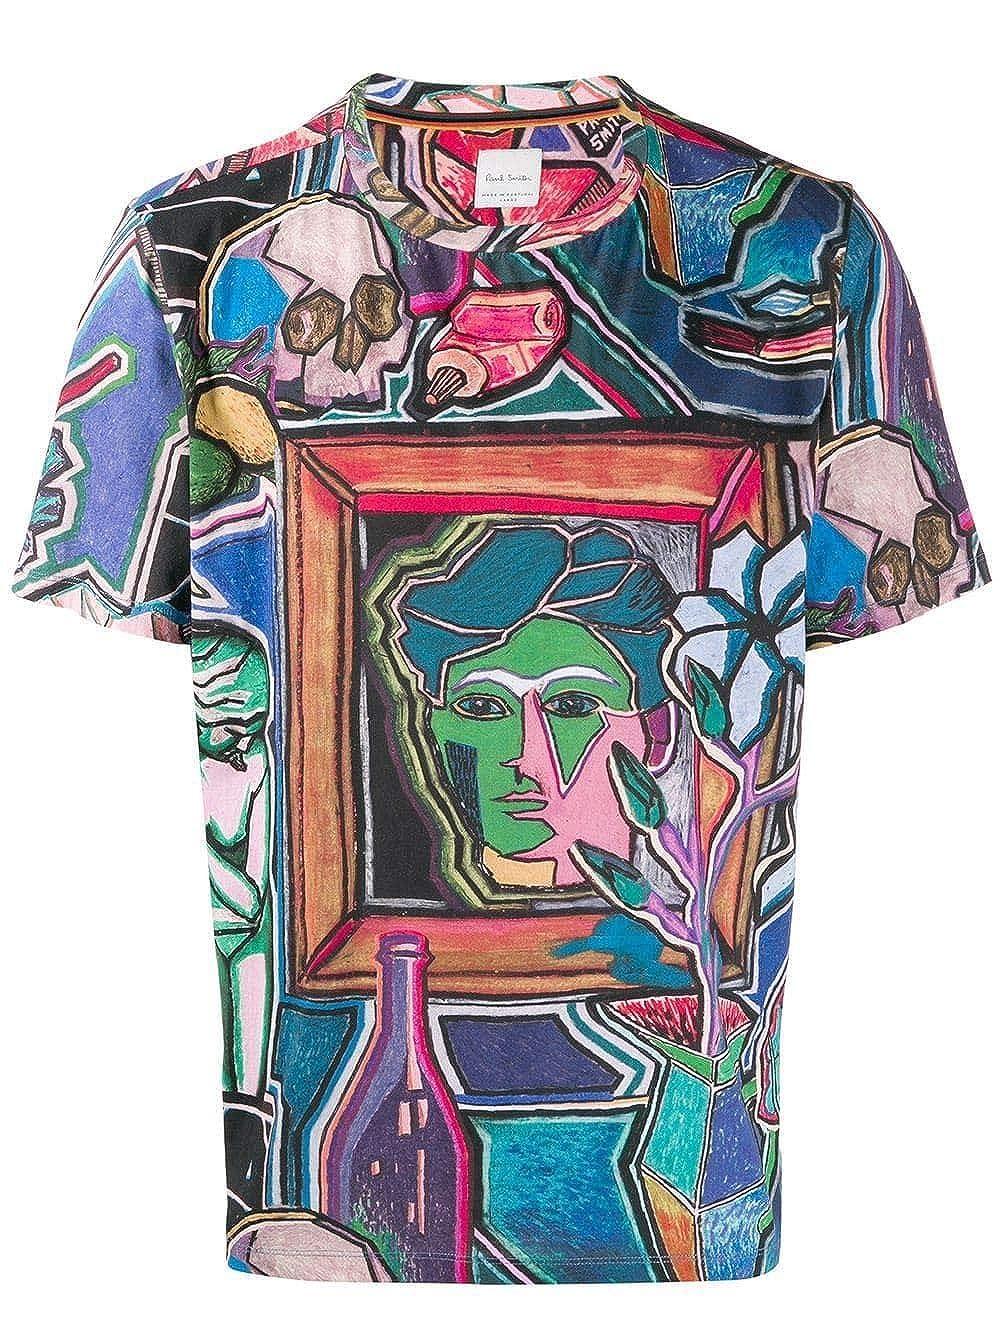 5e2e2bdf Amazon.com: Customized Broncos Women's t shirts at Ongkk: Clothing